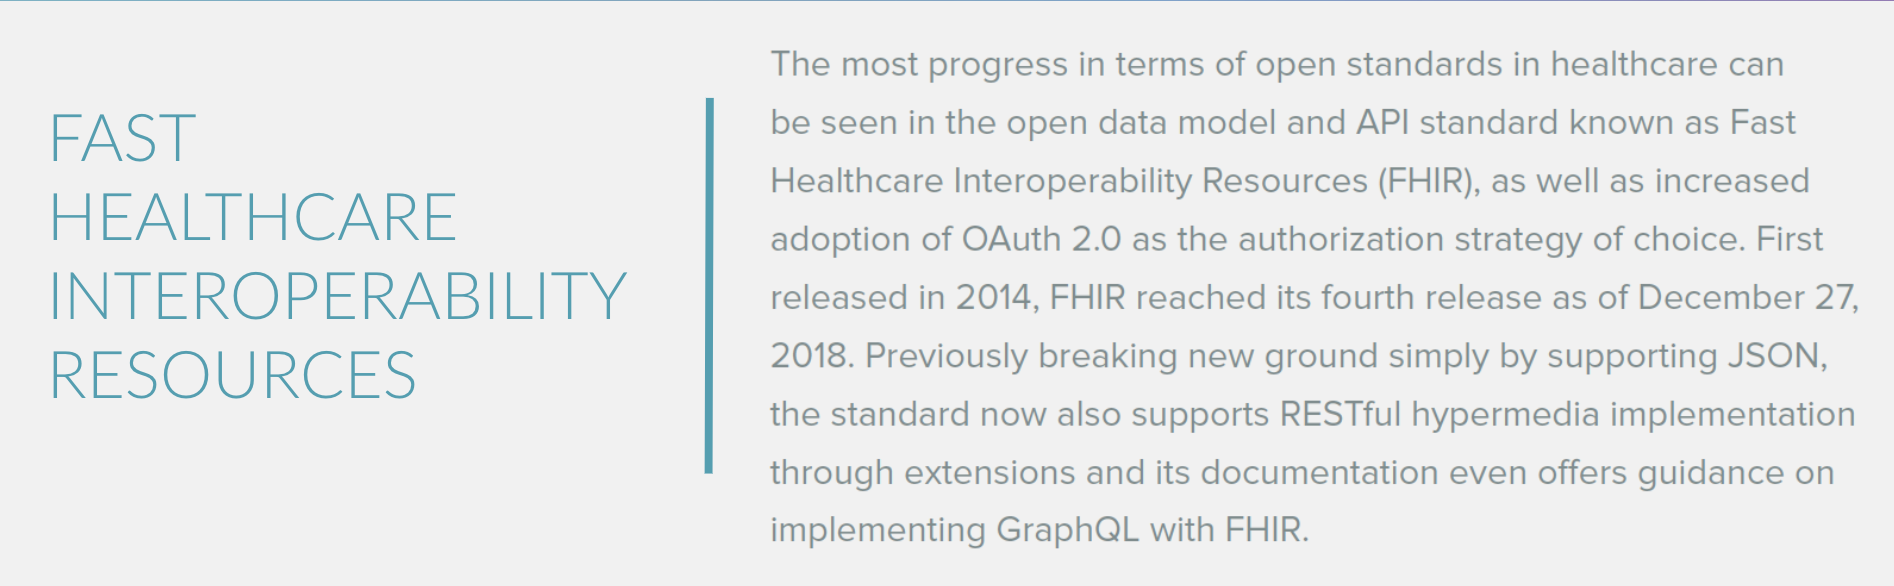 Fast Healthcare Interoperability Resources